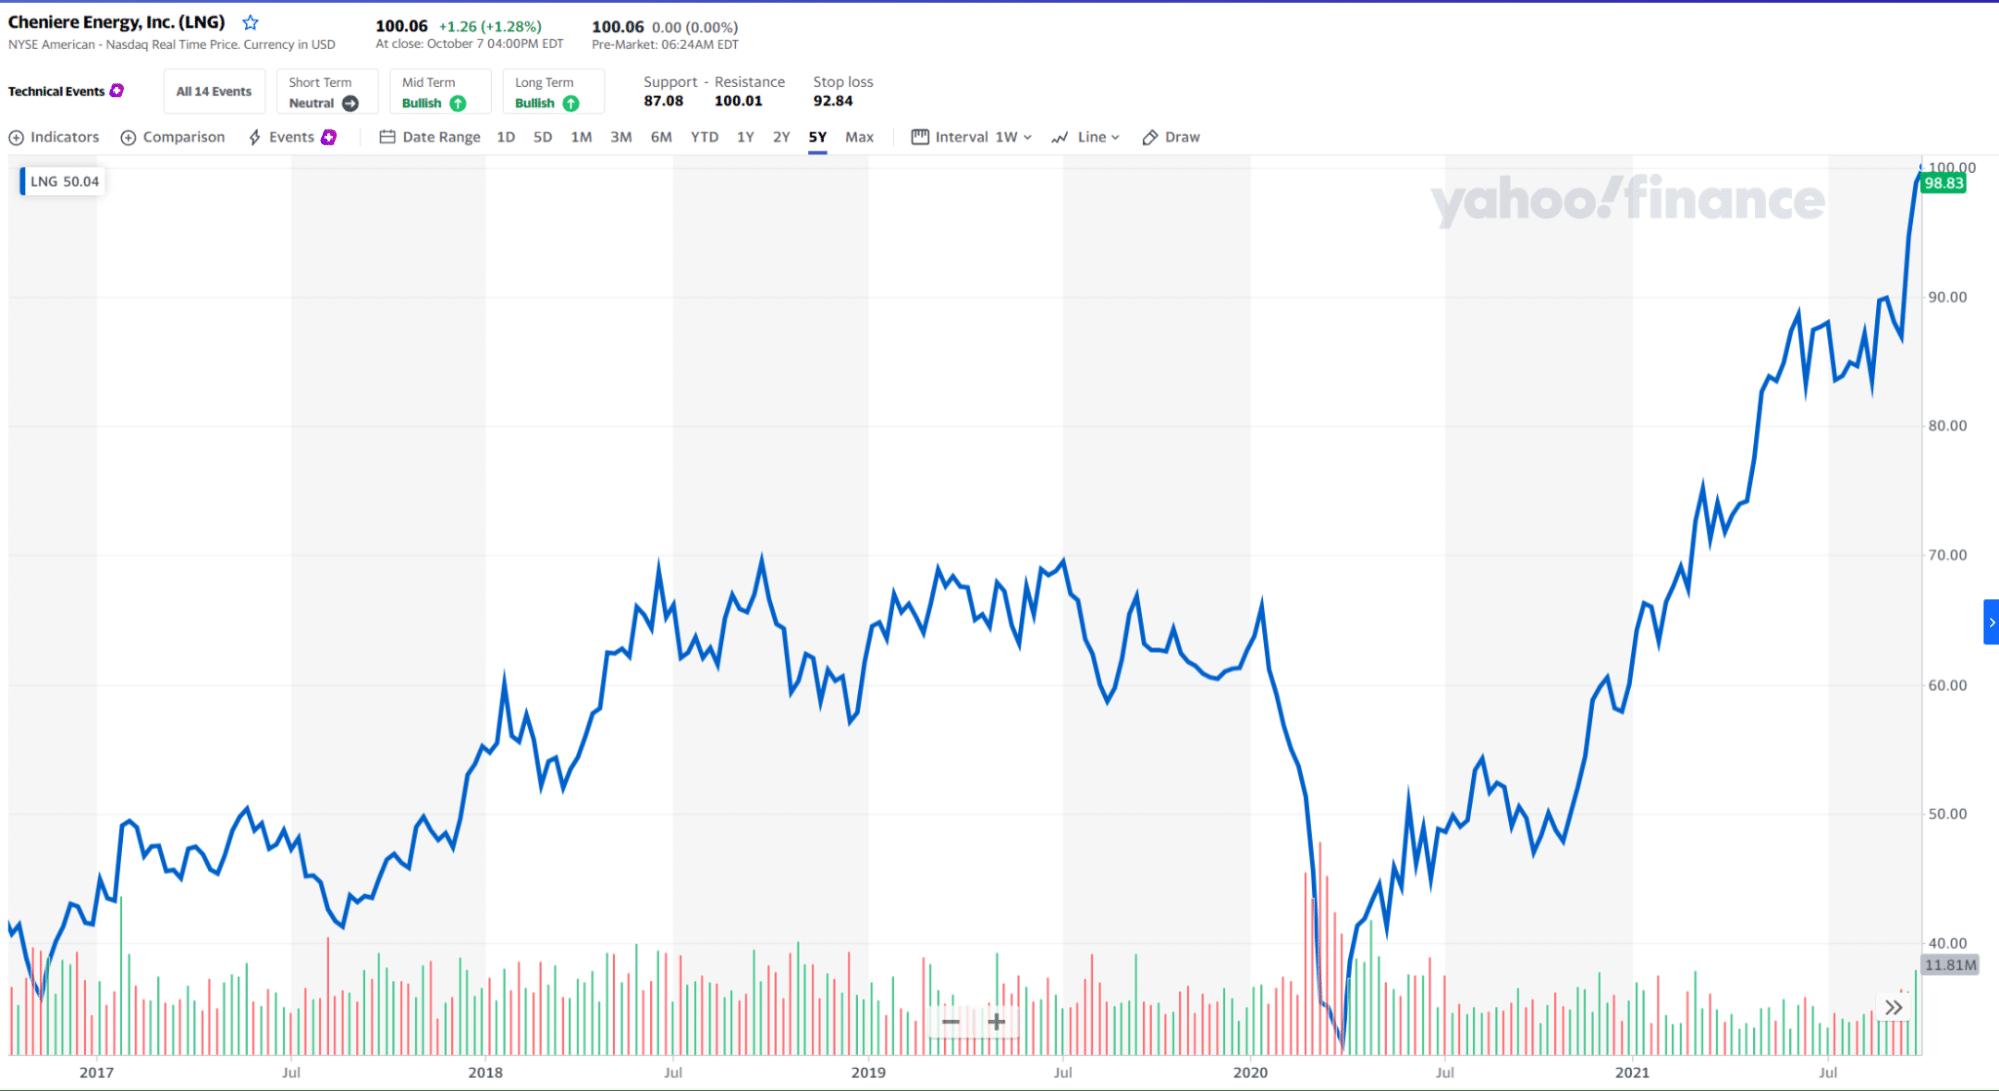 LNG price chart